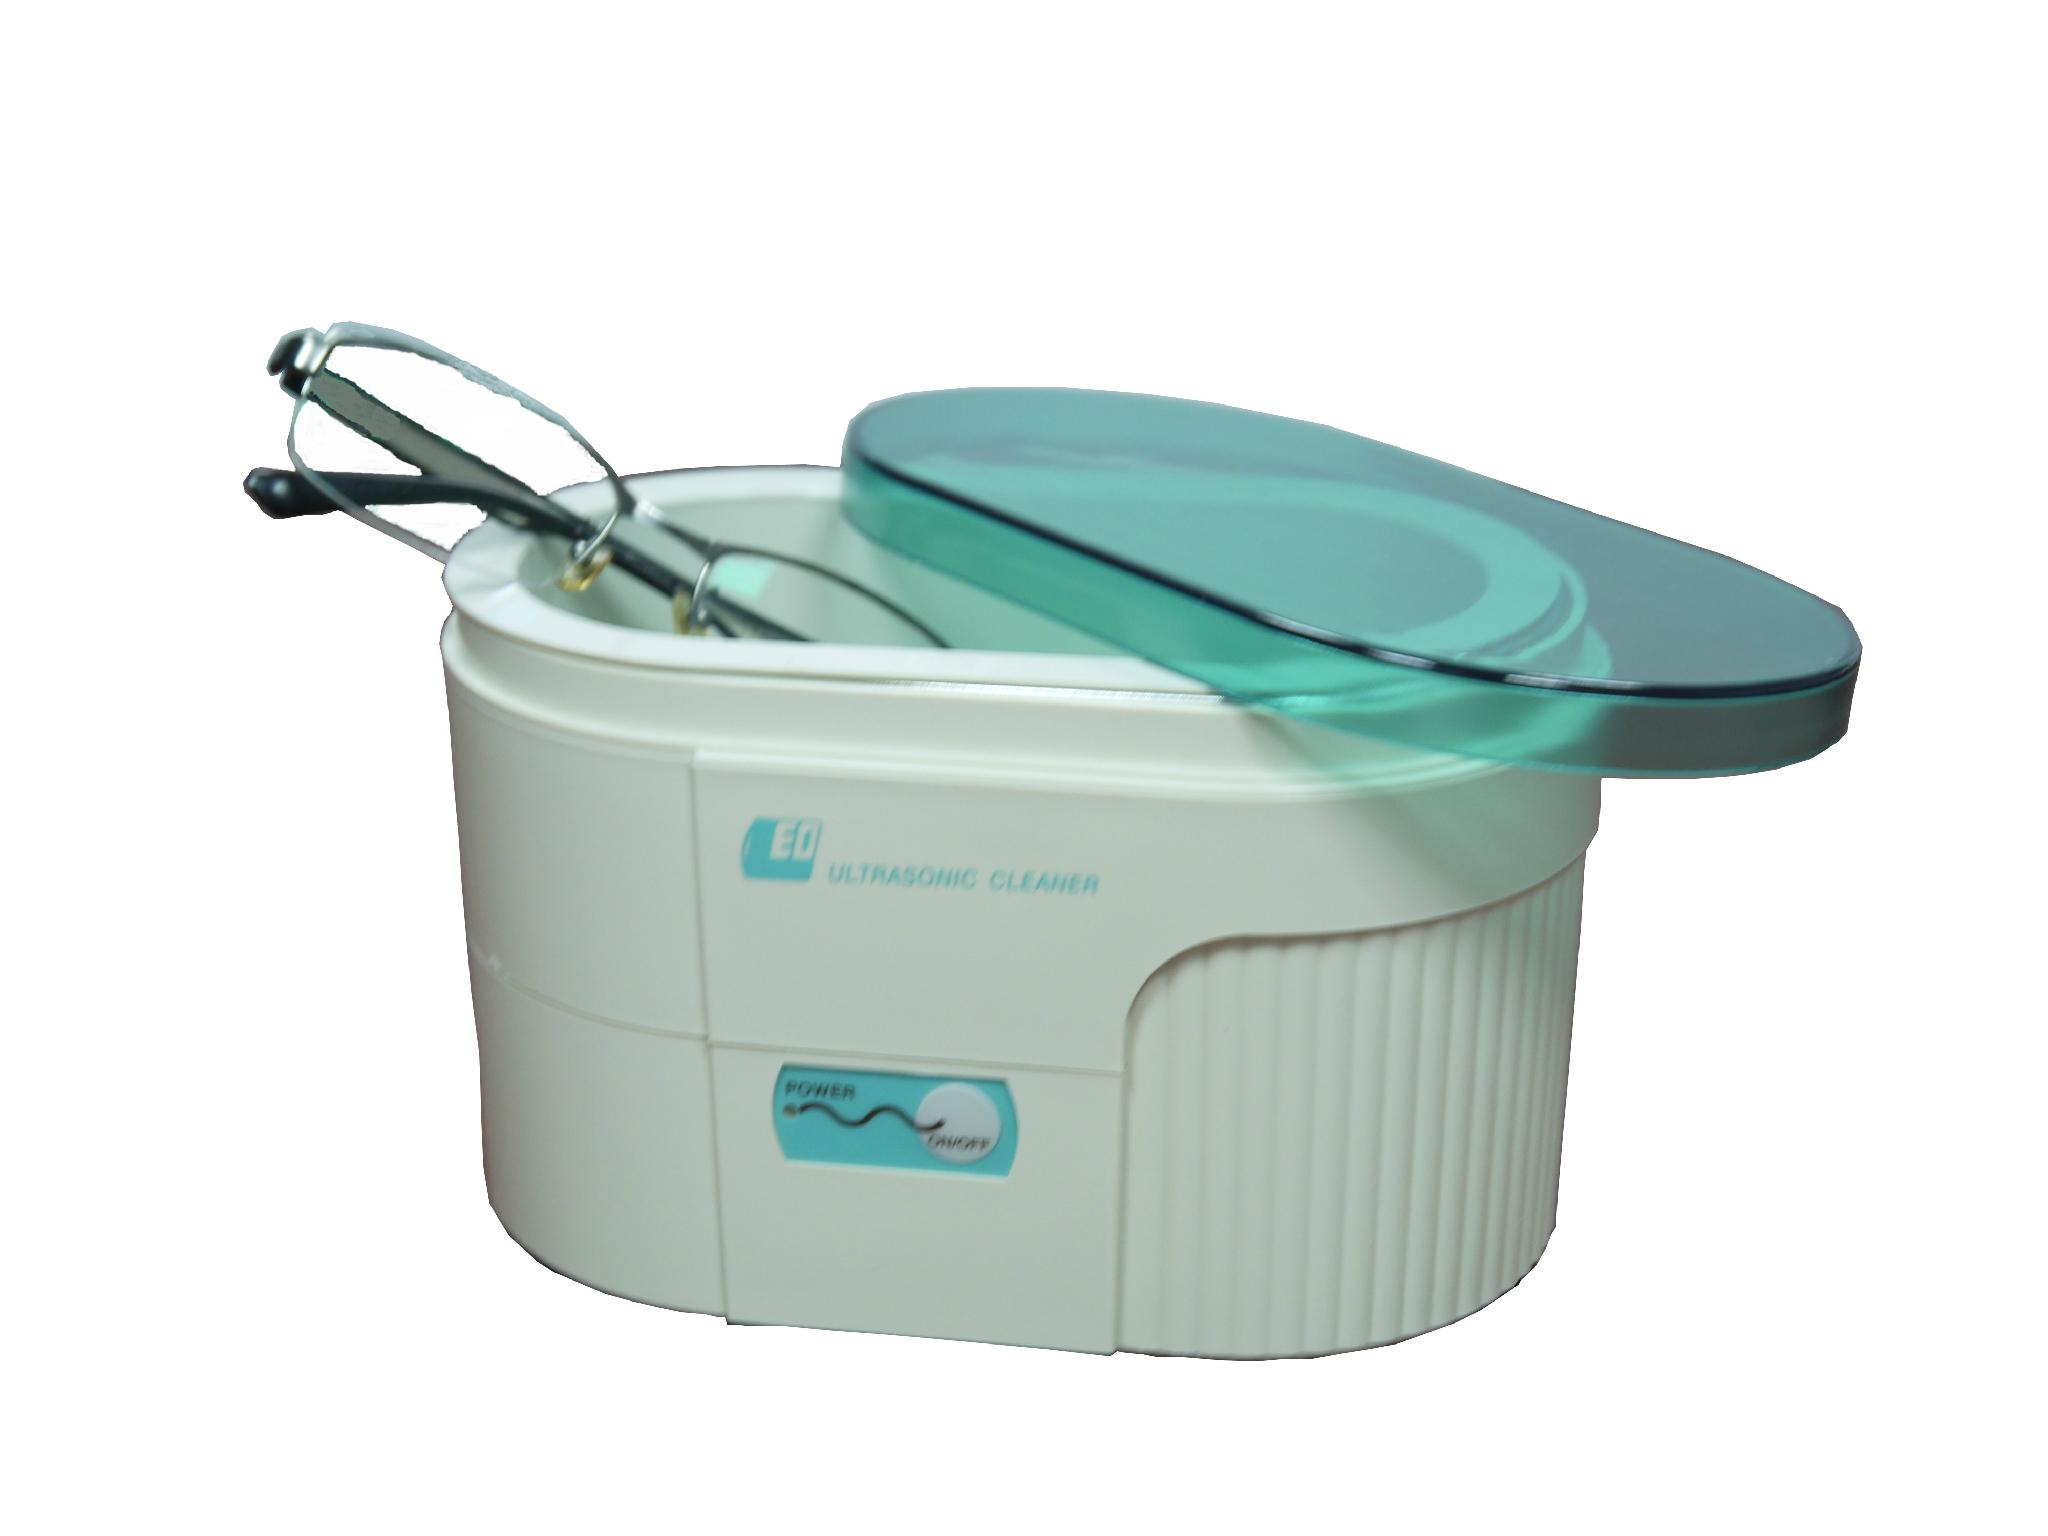 HEALTH CLEANER LEO-50 - Taiwan, China - Manufacturer